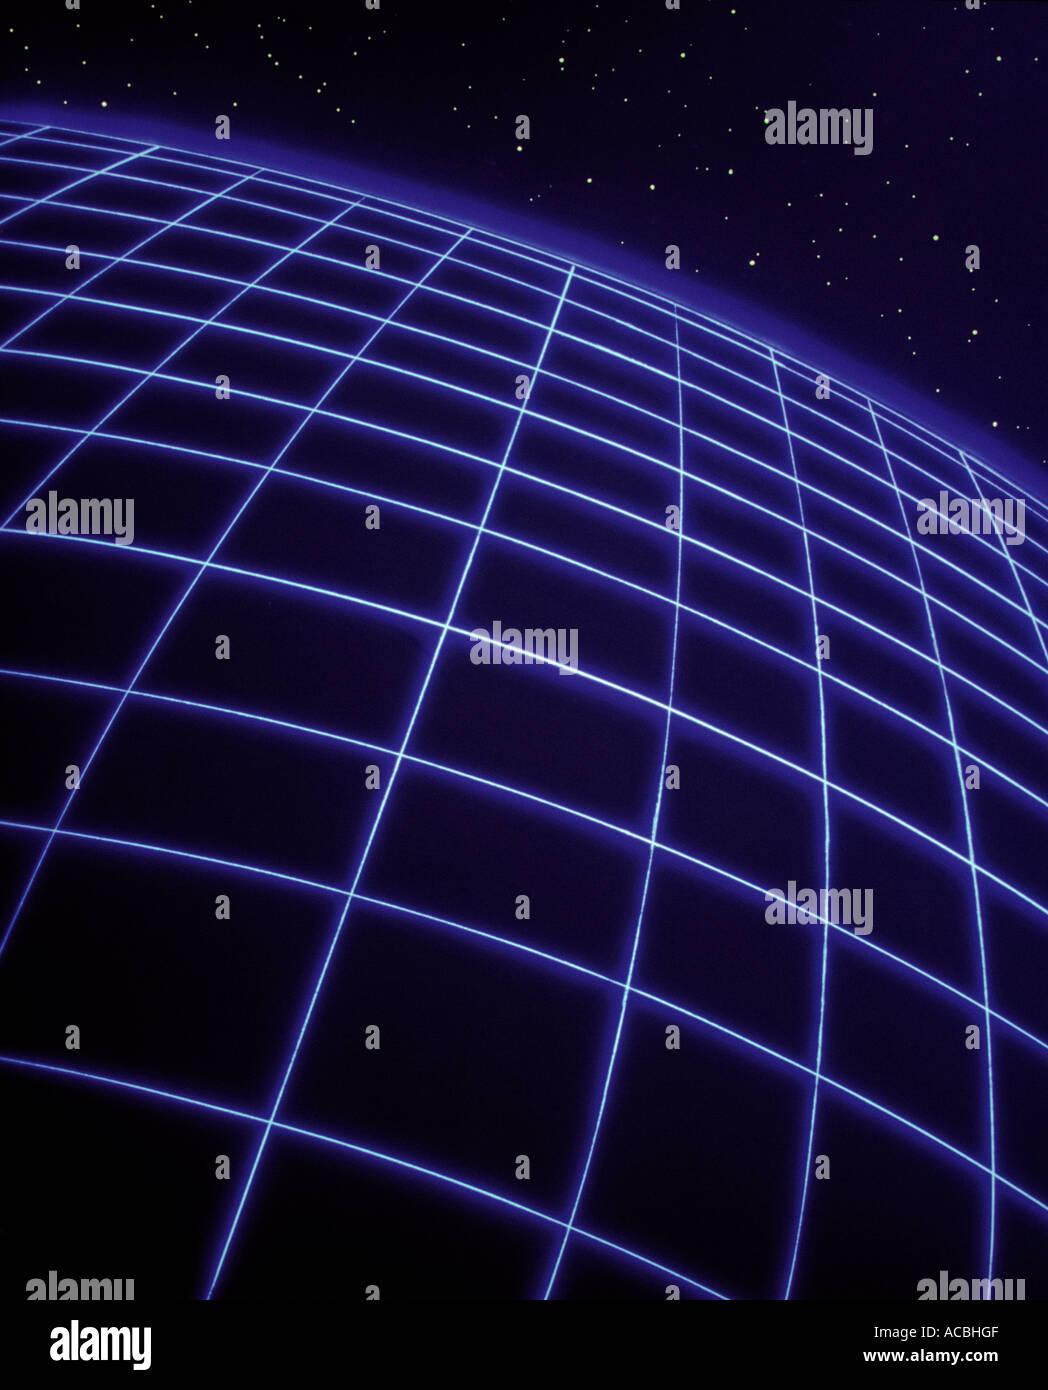 digital enhancement 3 dimensional grid sphere in cosmic space with stars - Stock Image